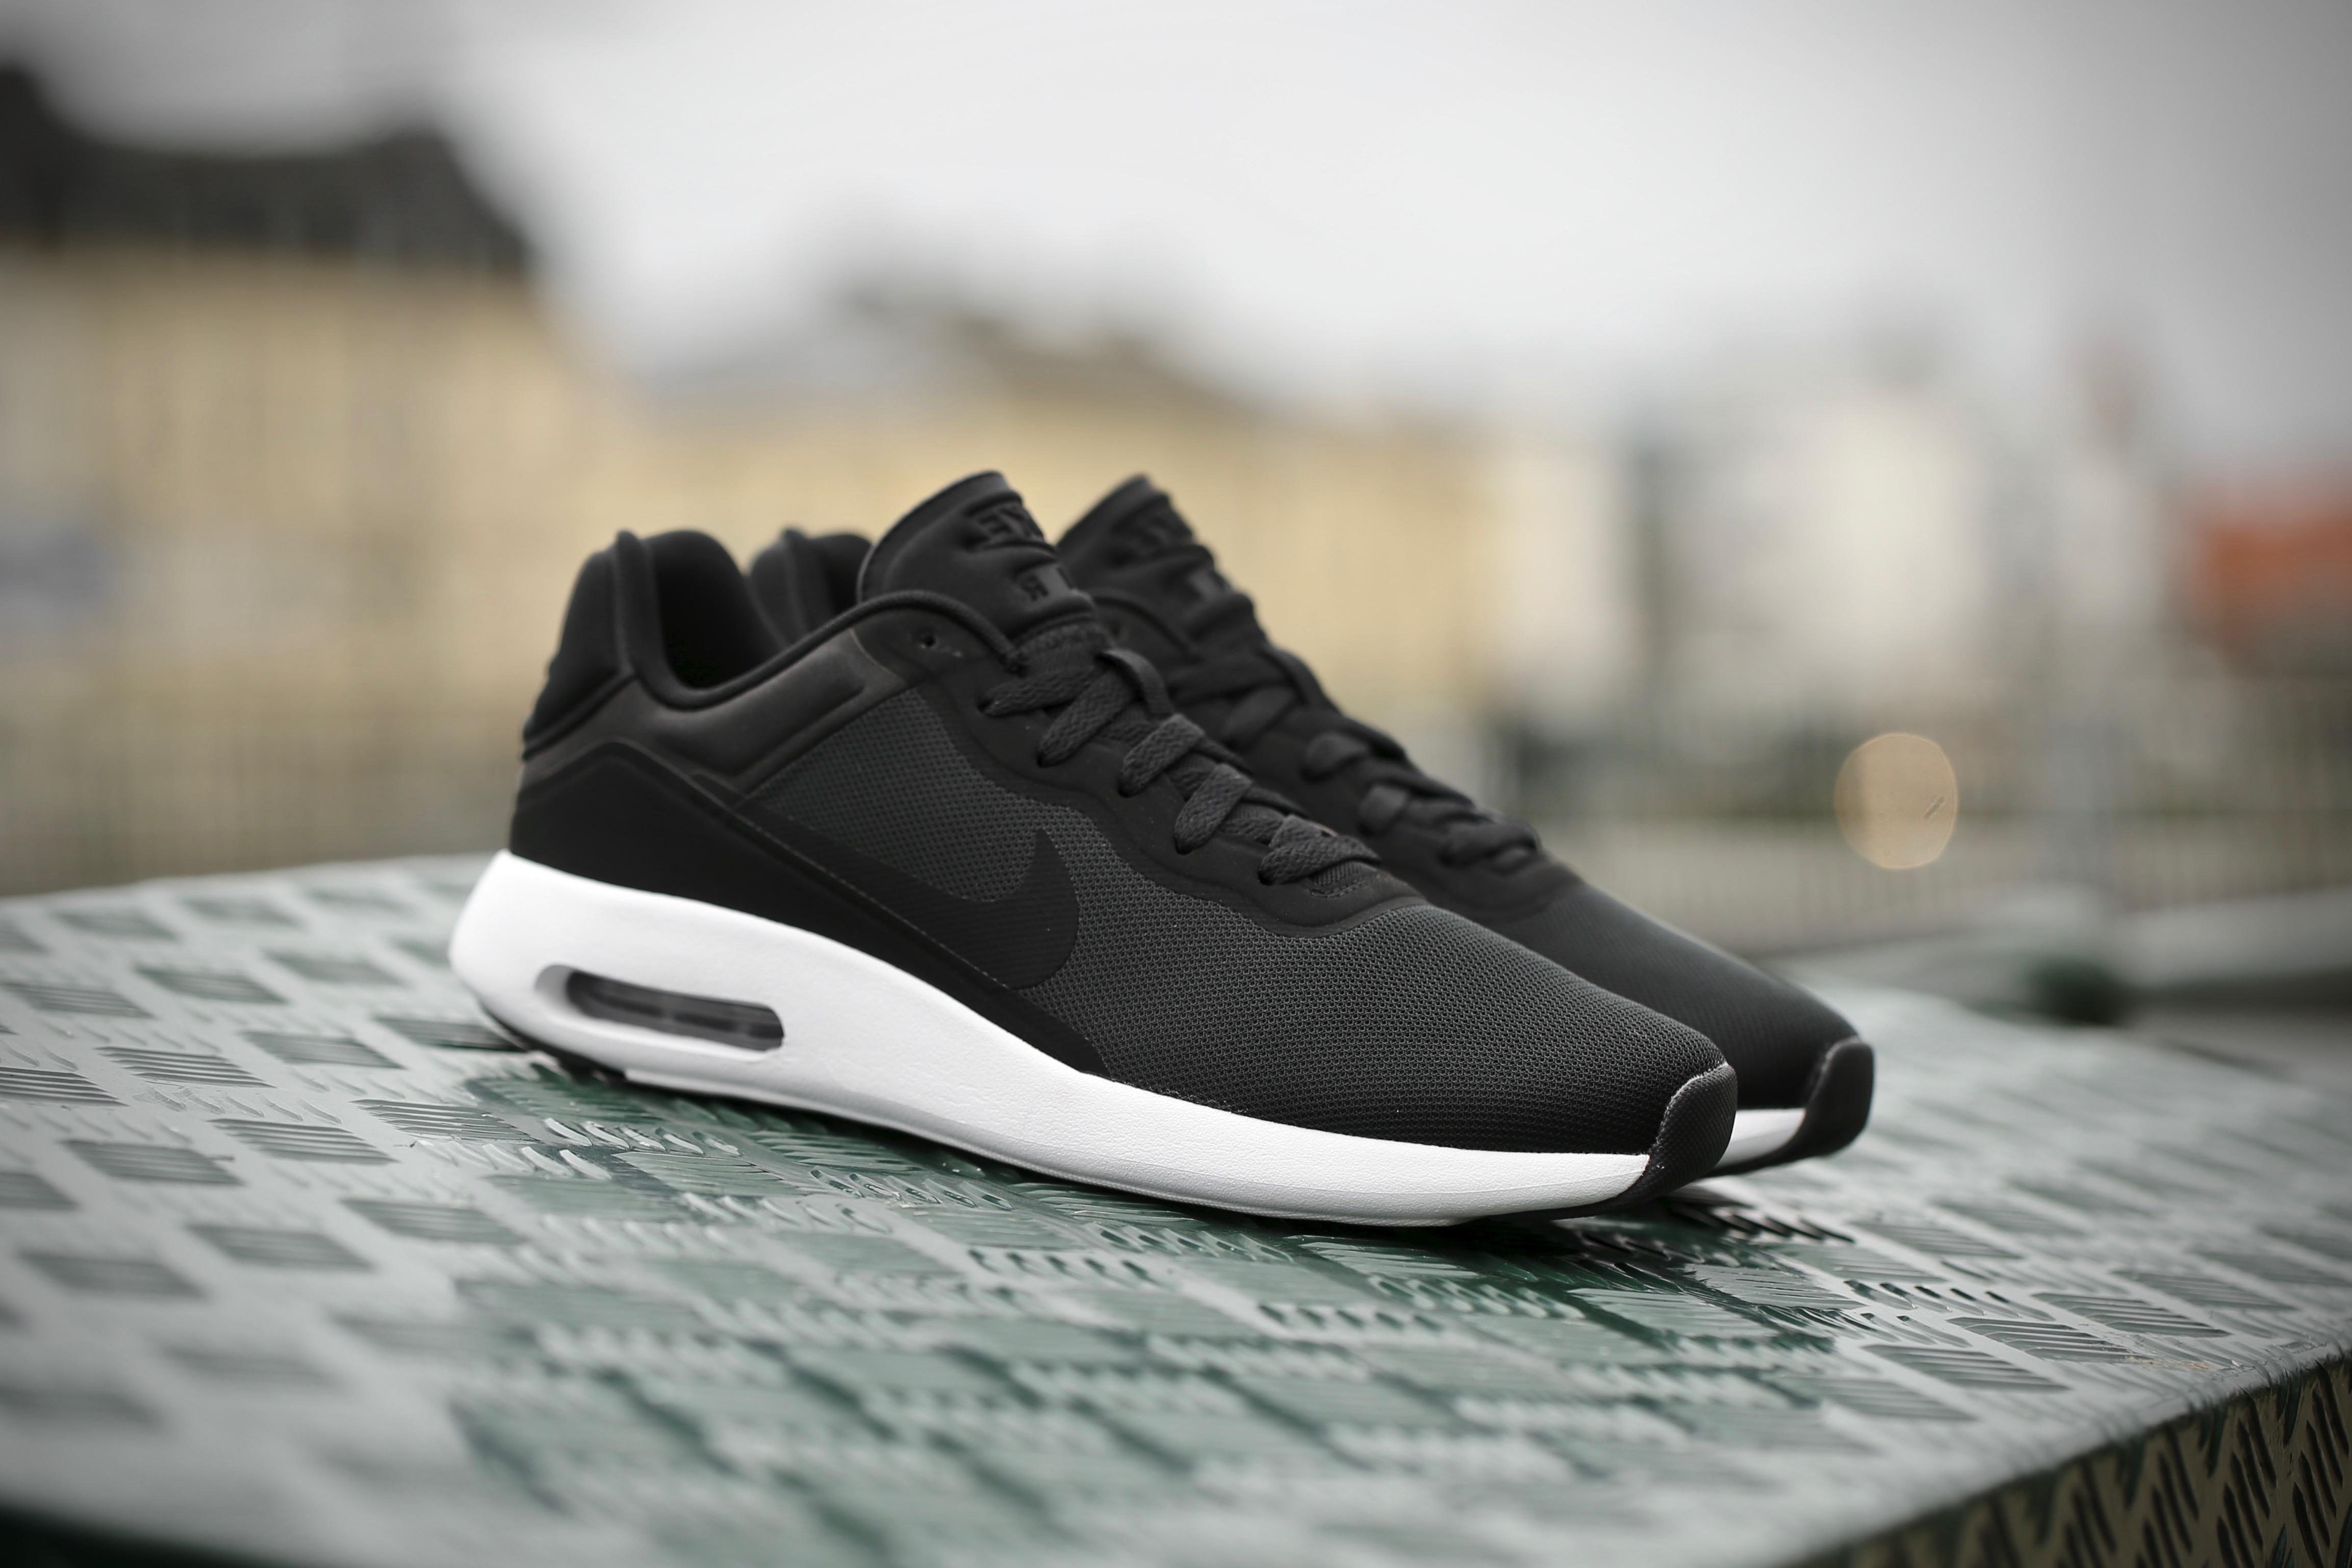 Nike Air Max Modern Essential Black Anthracite White